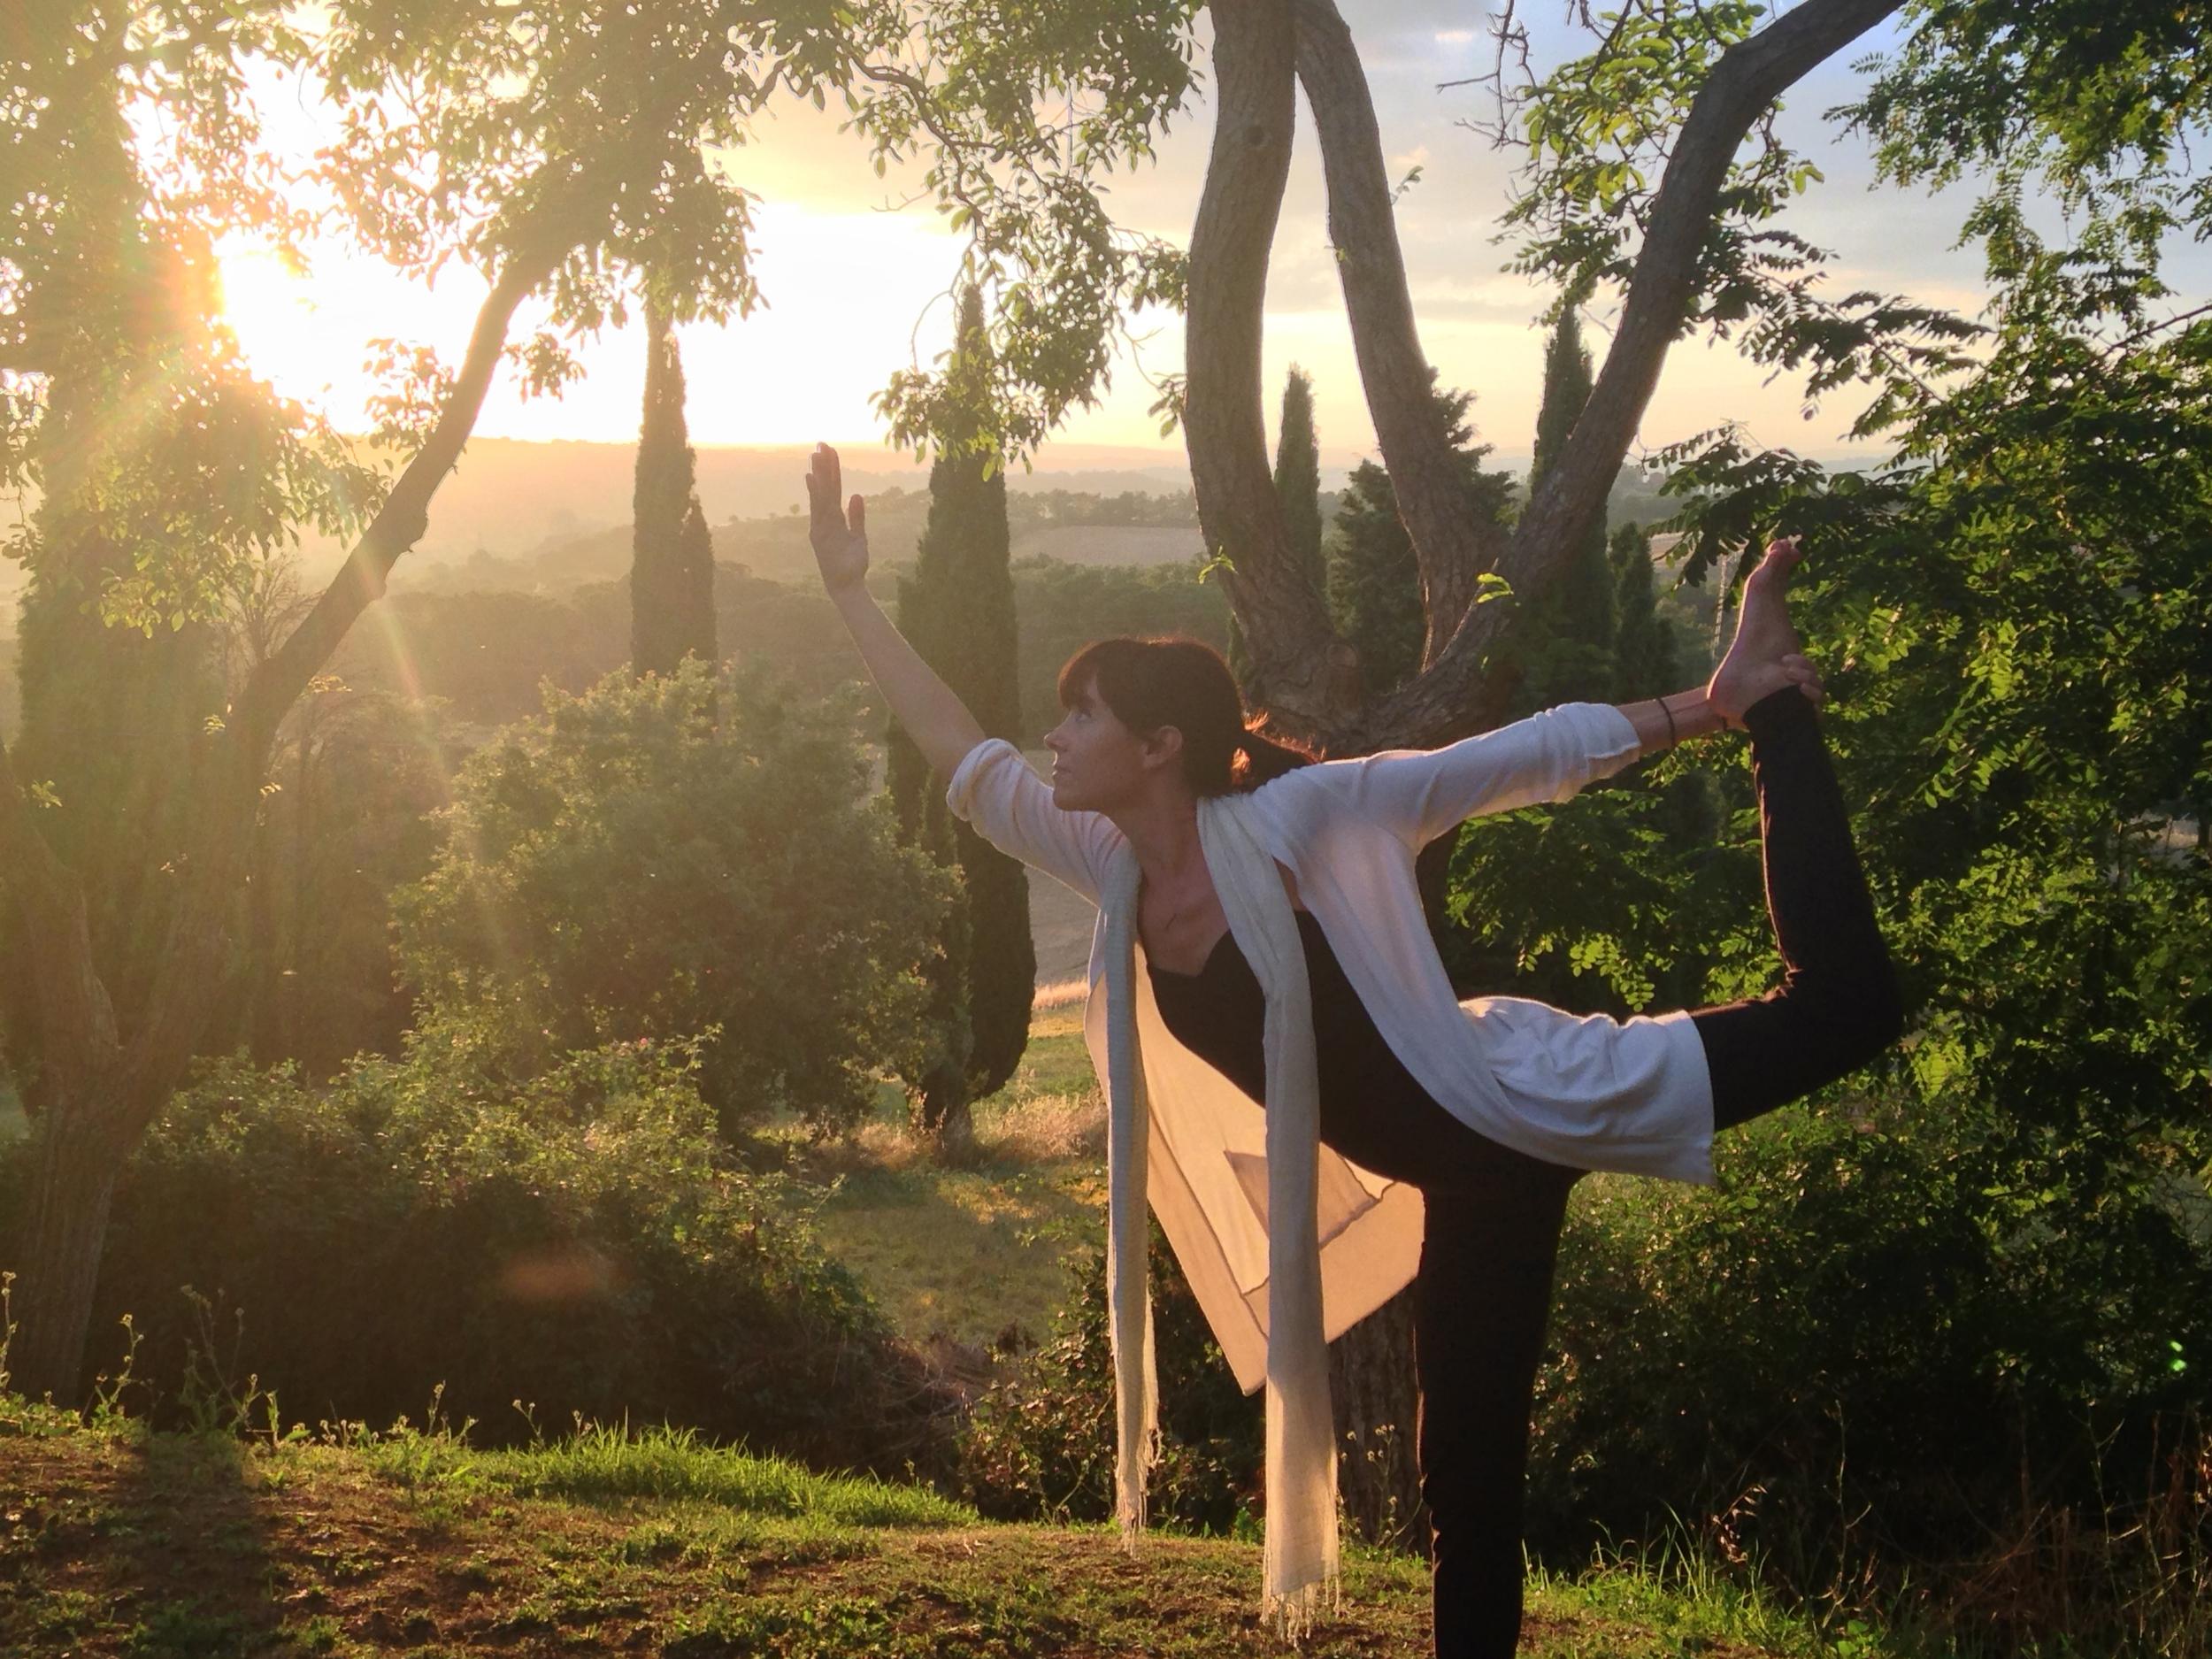 Yoga teacher Erin Lewis EAT.PRAY.MOVE Yoga Retreats | Tuscany, Italy